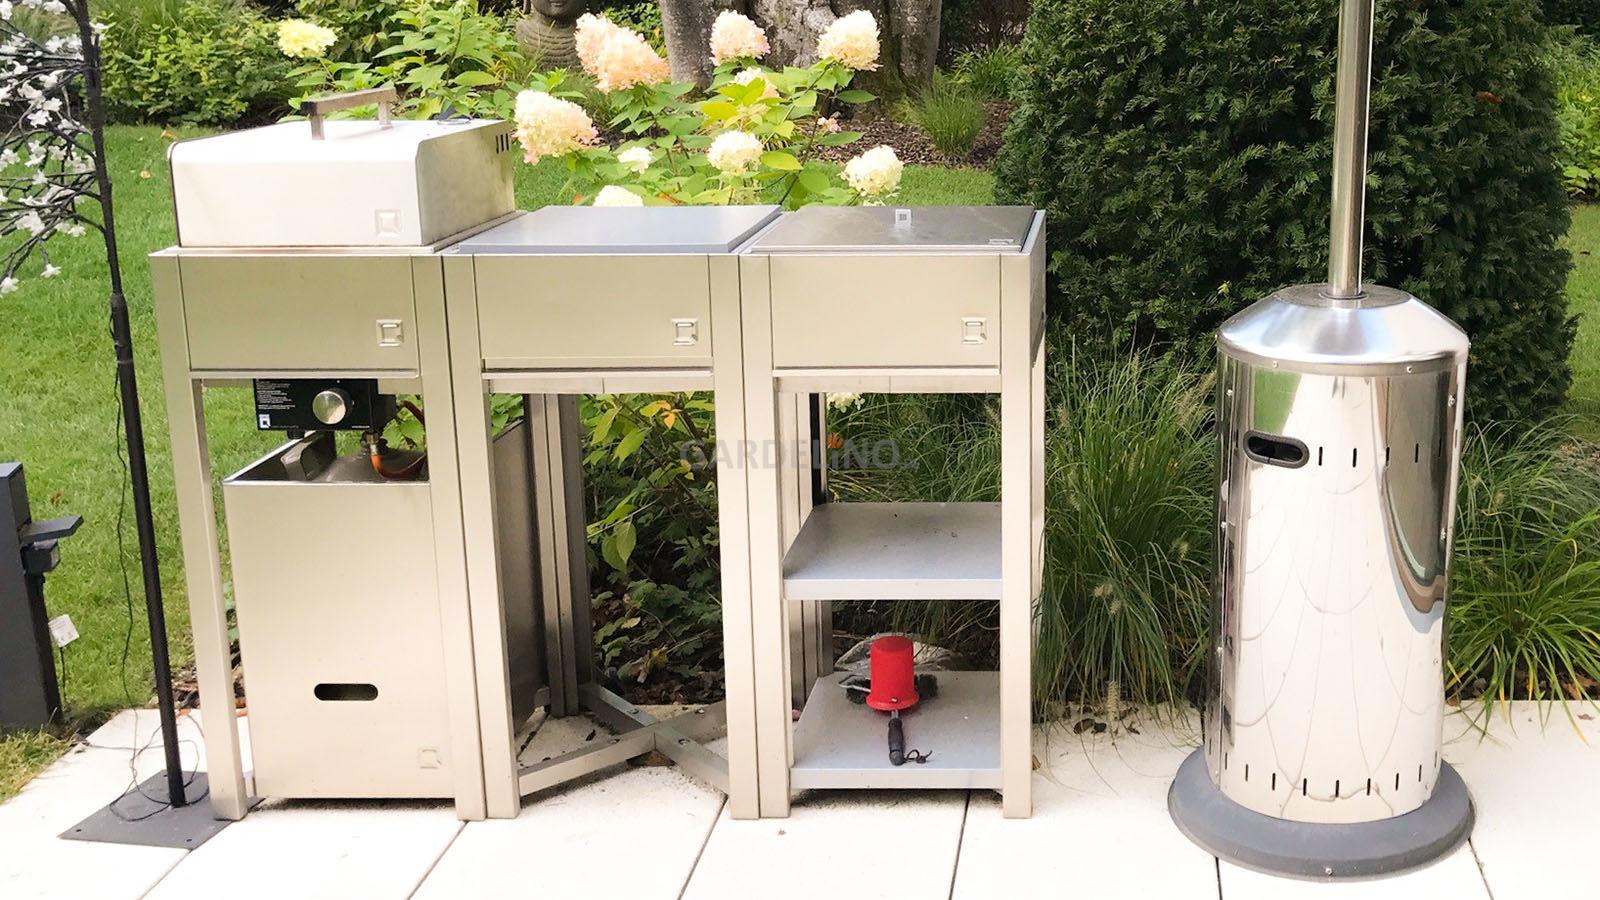 Outdoorküche Garten Edelstahl Günstig : Garten lounge outdoor küche edelstahl spüle youtube